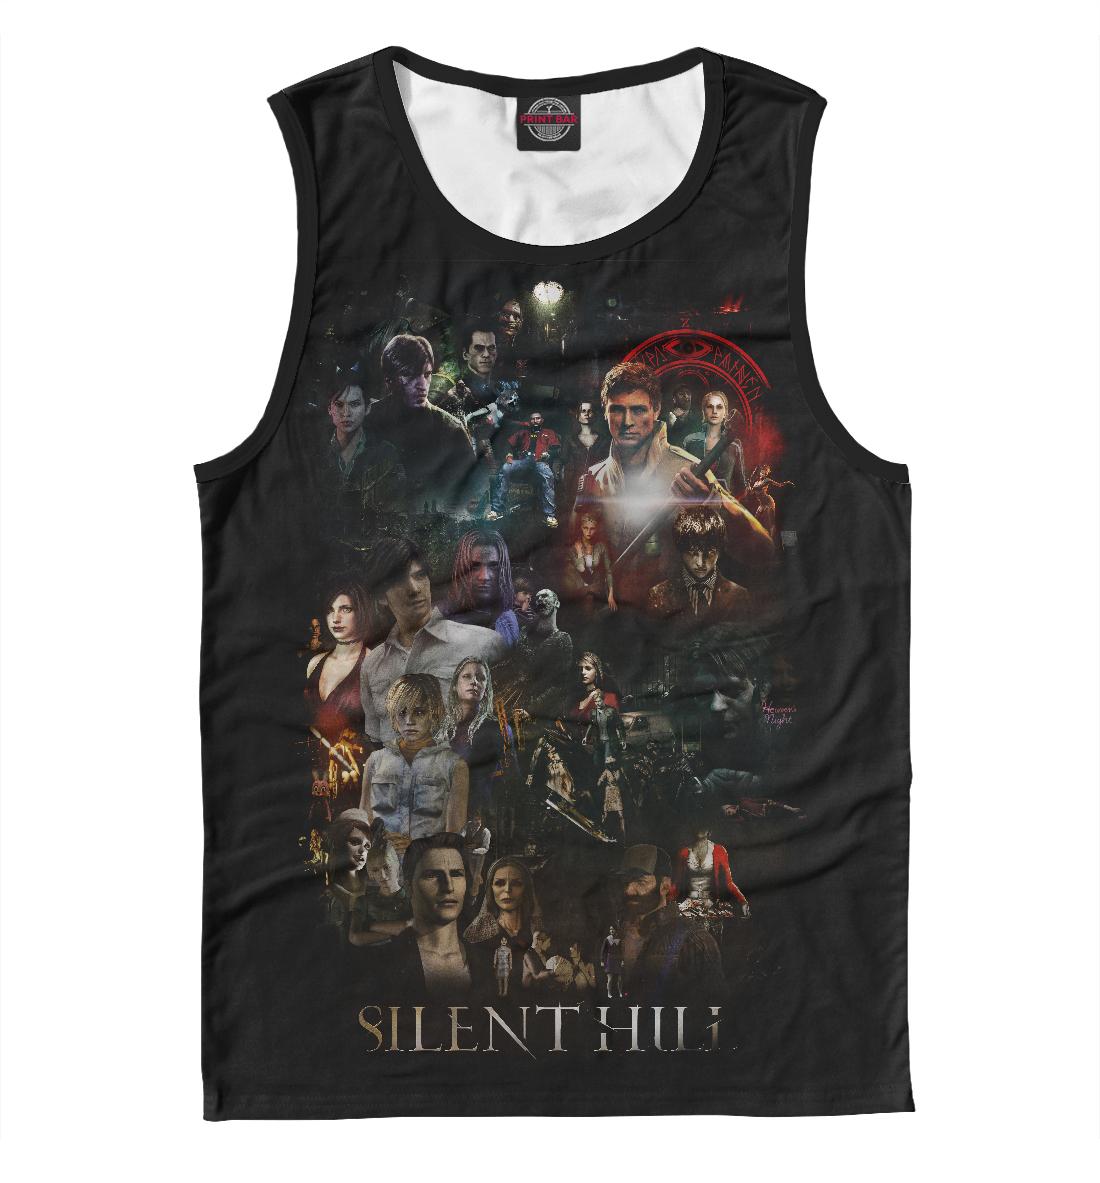 Silent Hill, Printbar, Майки, RPG-902081-may-2  - купить со скидкой